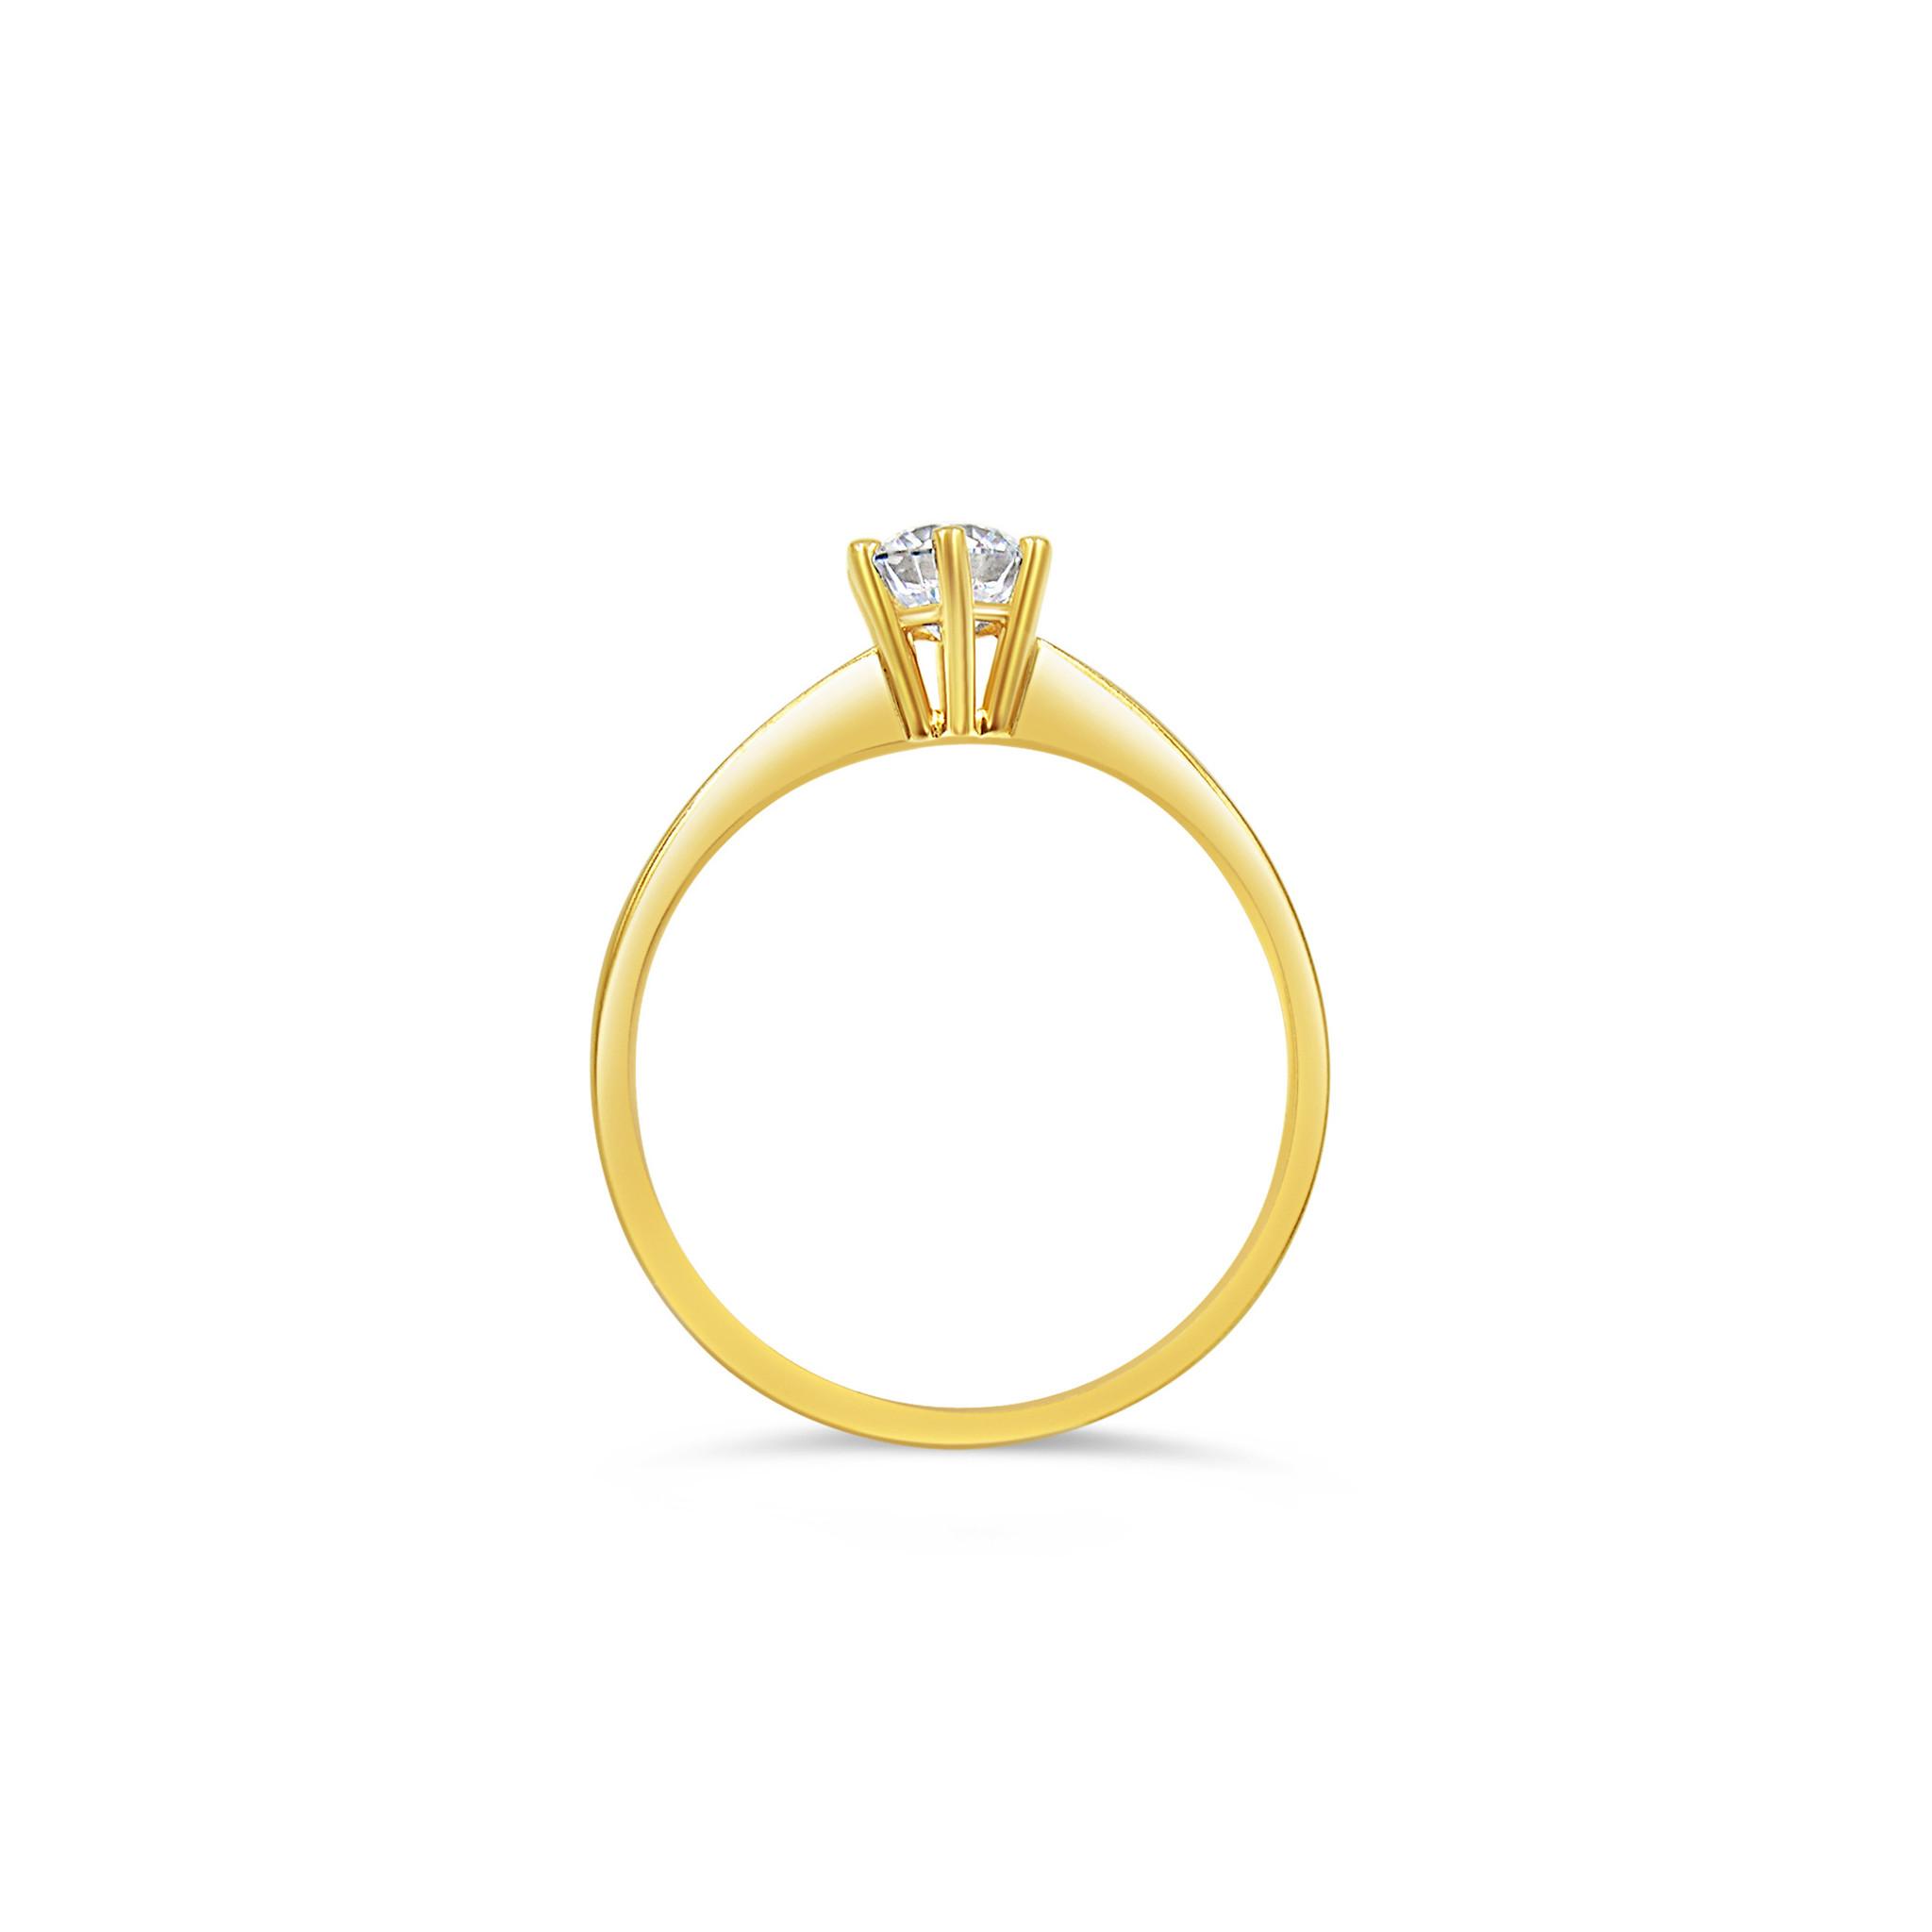 14kt geel goud verlovingsring met zirkonia